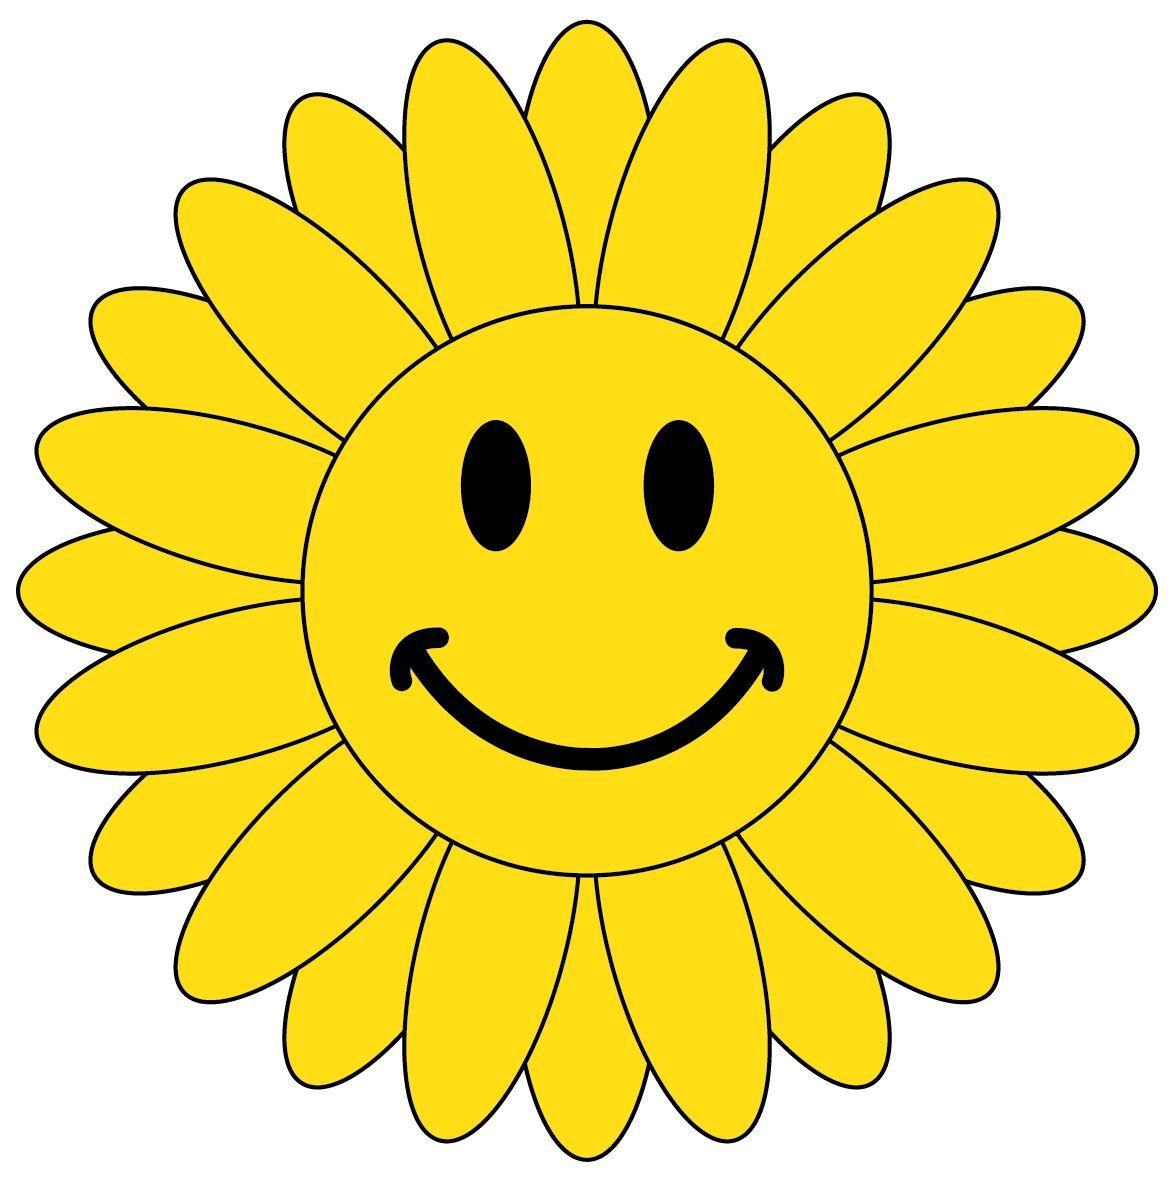 Flower smiley face clipart image freeuse Moving Smiley Faces Clip Art | Animated Smiley Face Clip Art ... image freeuse